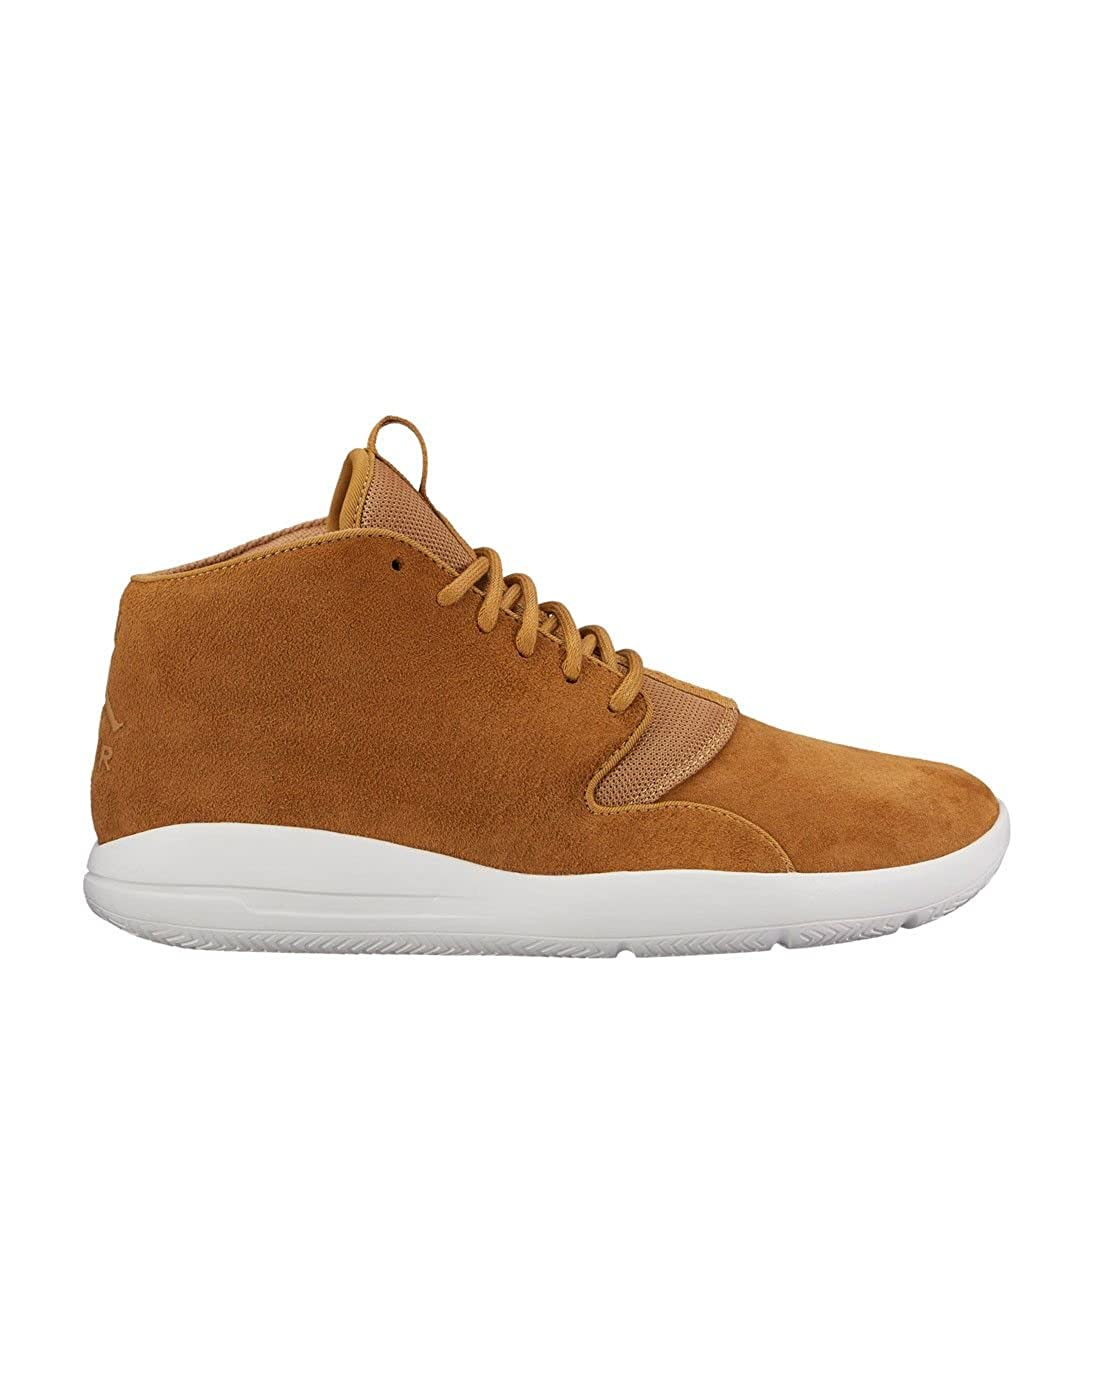 92f3433b5de Nike Men s Jordan Eclipse Chukka Lea Basketball Shoes  Amazon.co.uk  Shoes    Bags